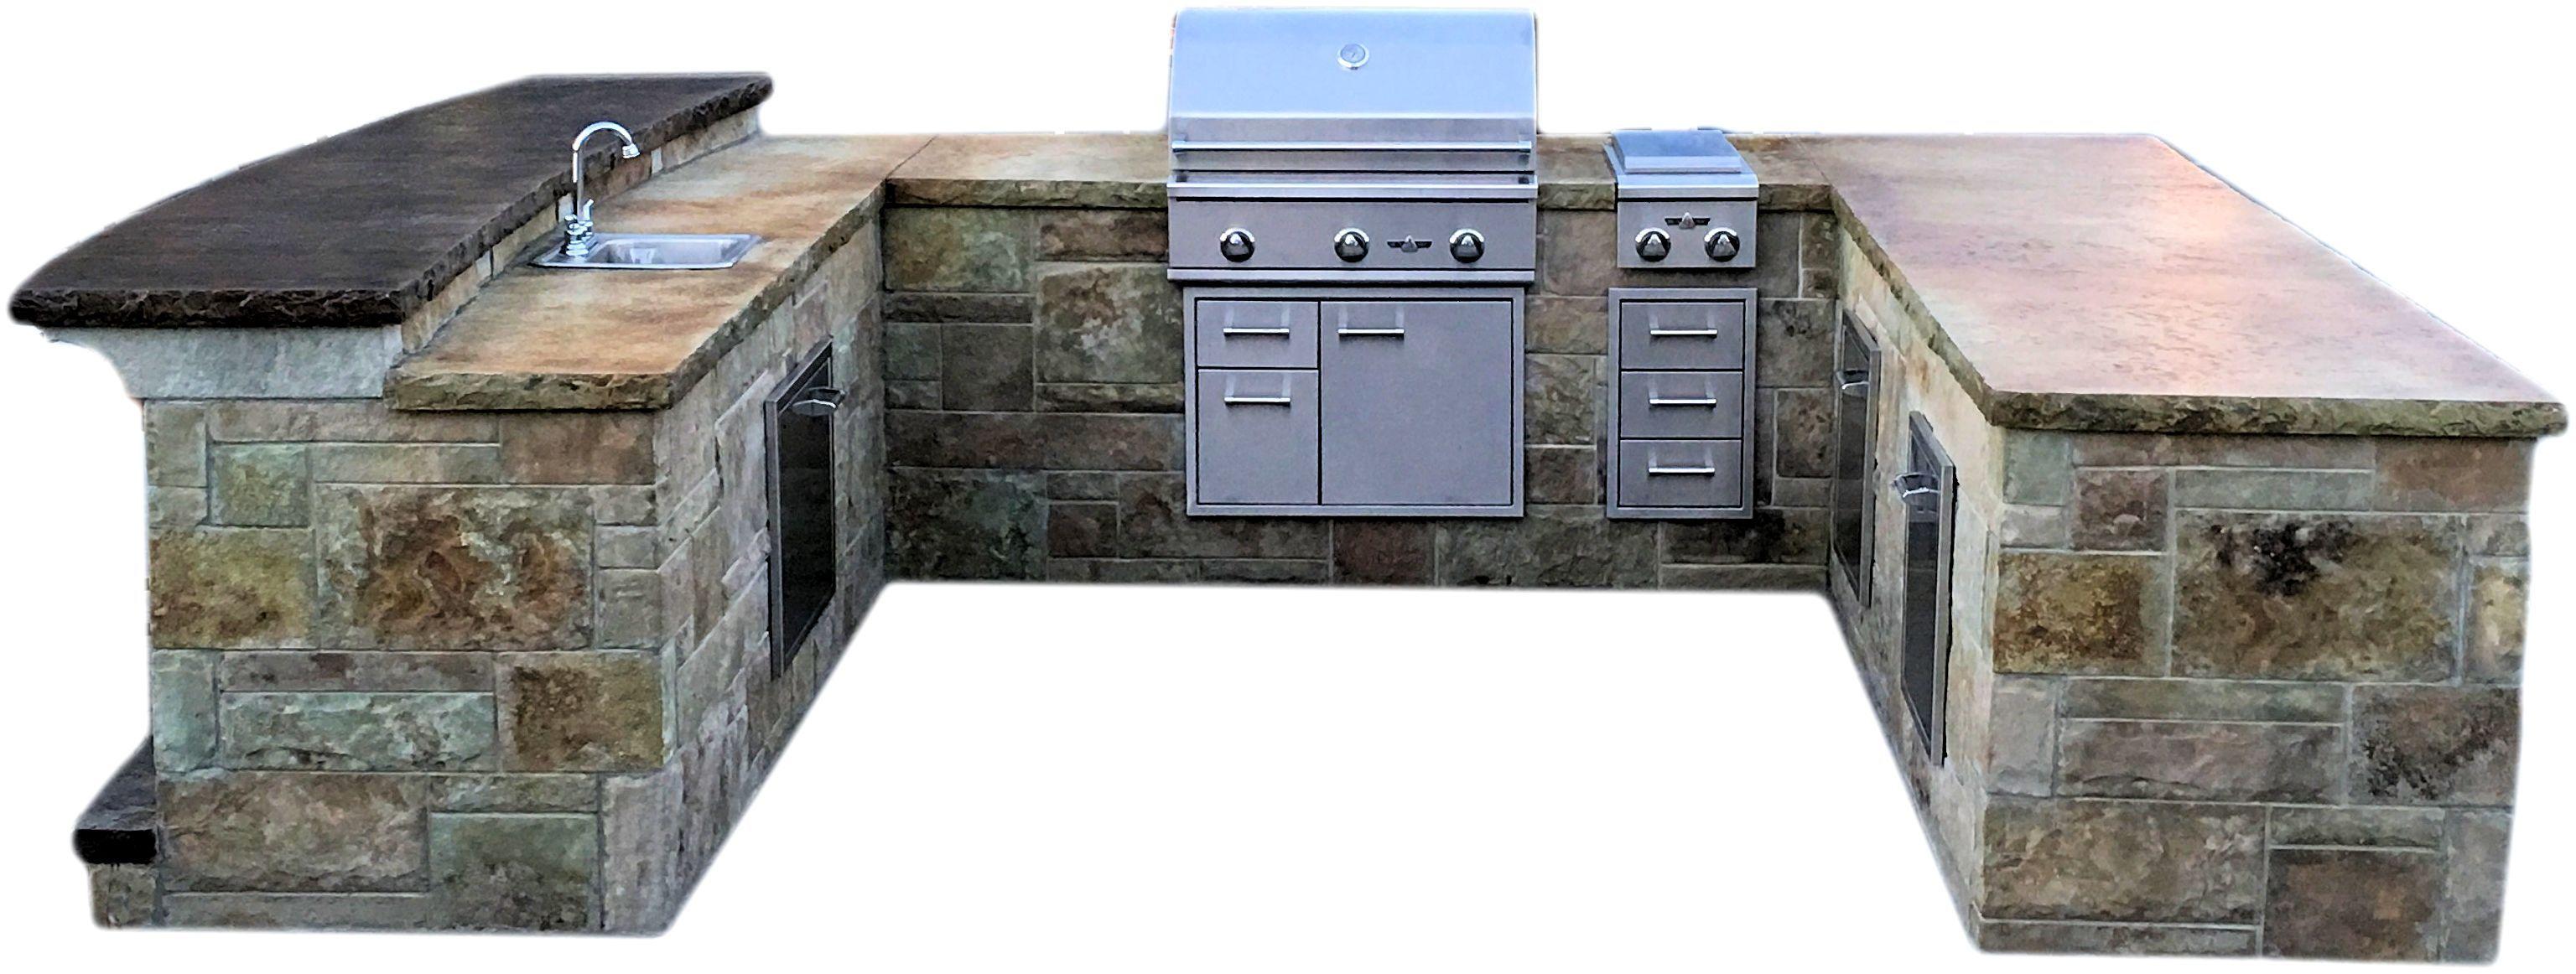 Modular Precast Panel Kitchen U Shaped 10 Ft With Bar Outdoor Kitchen Design Kitchen Remodel Countertops Outdoor Kitchen